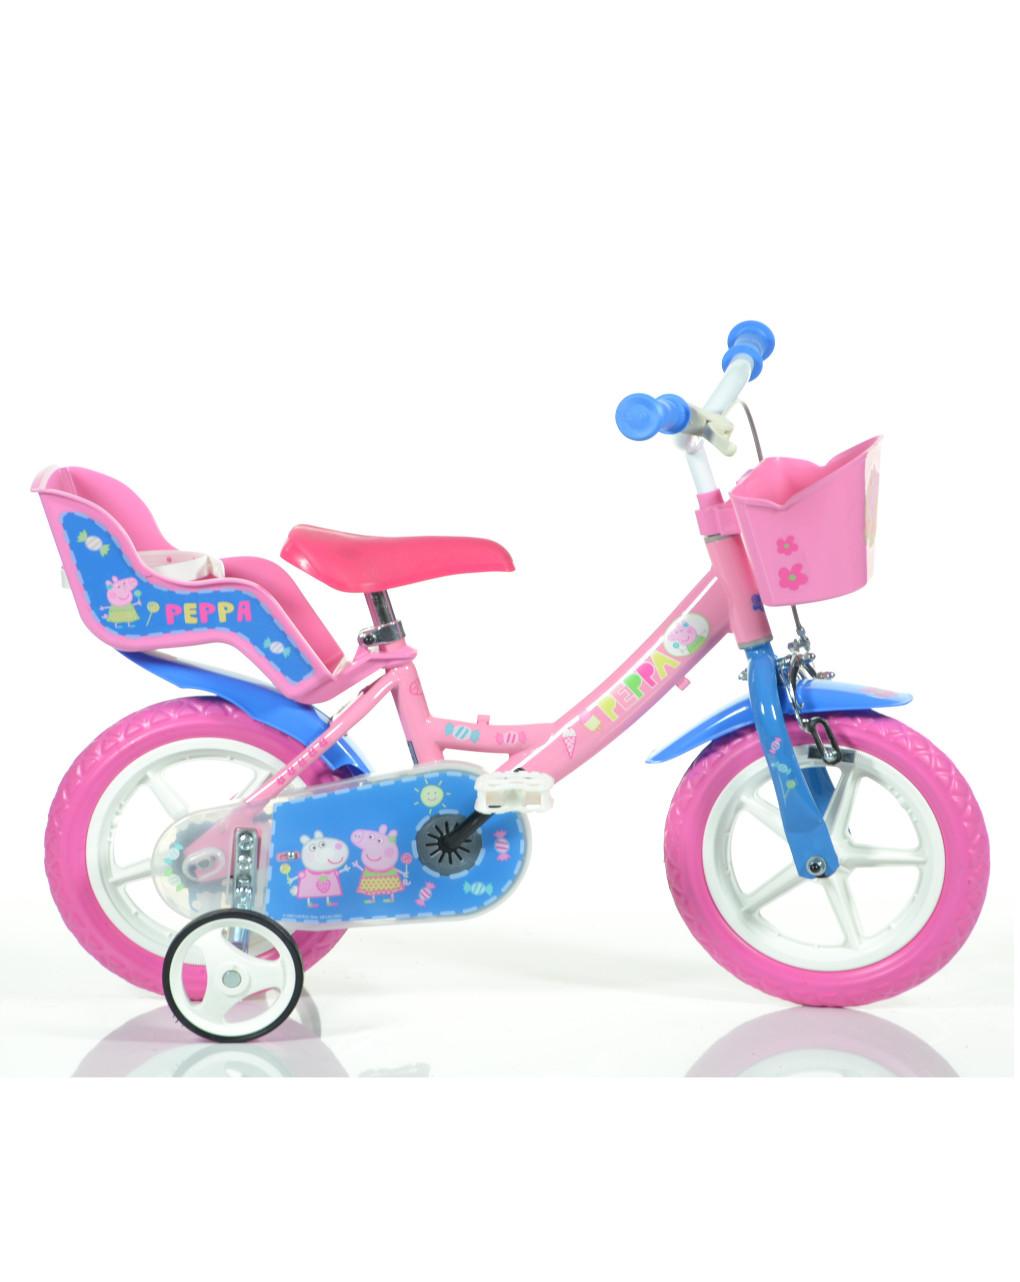 Bici 12'' peppa pig - Dinobikes